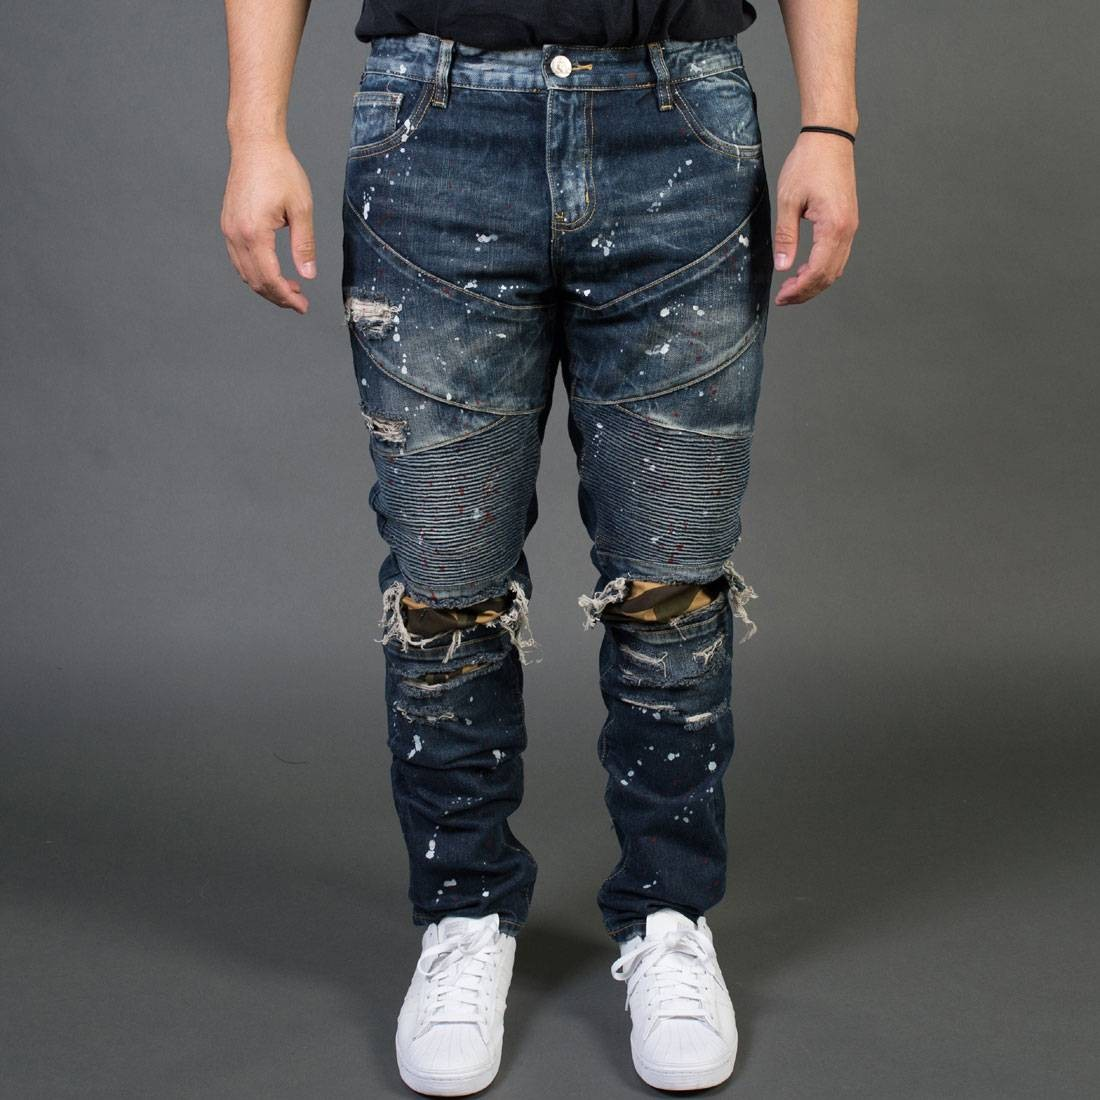 【 EMBELLISH NYC MEN BAD BIKER JEANS BLUE VINTAGE 】 メンズファッション ズボン パンツ 送料無料